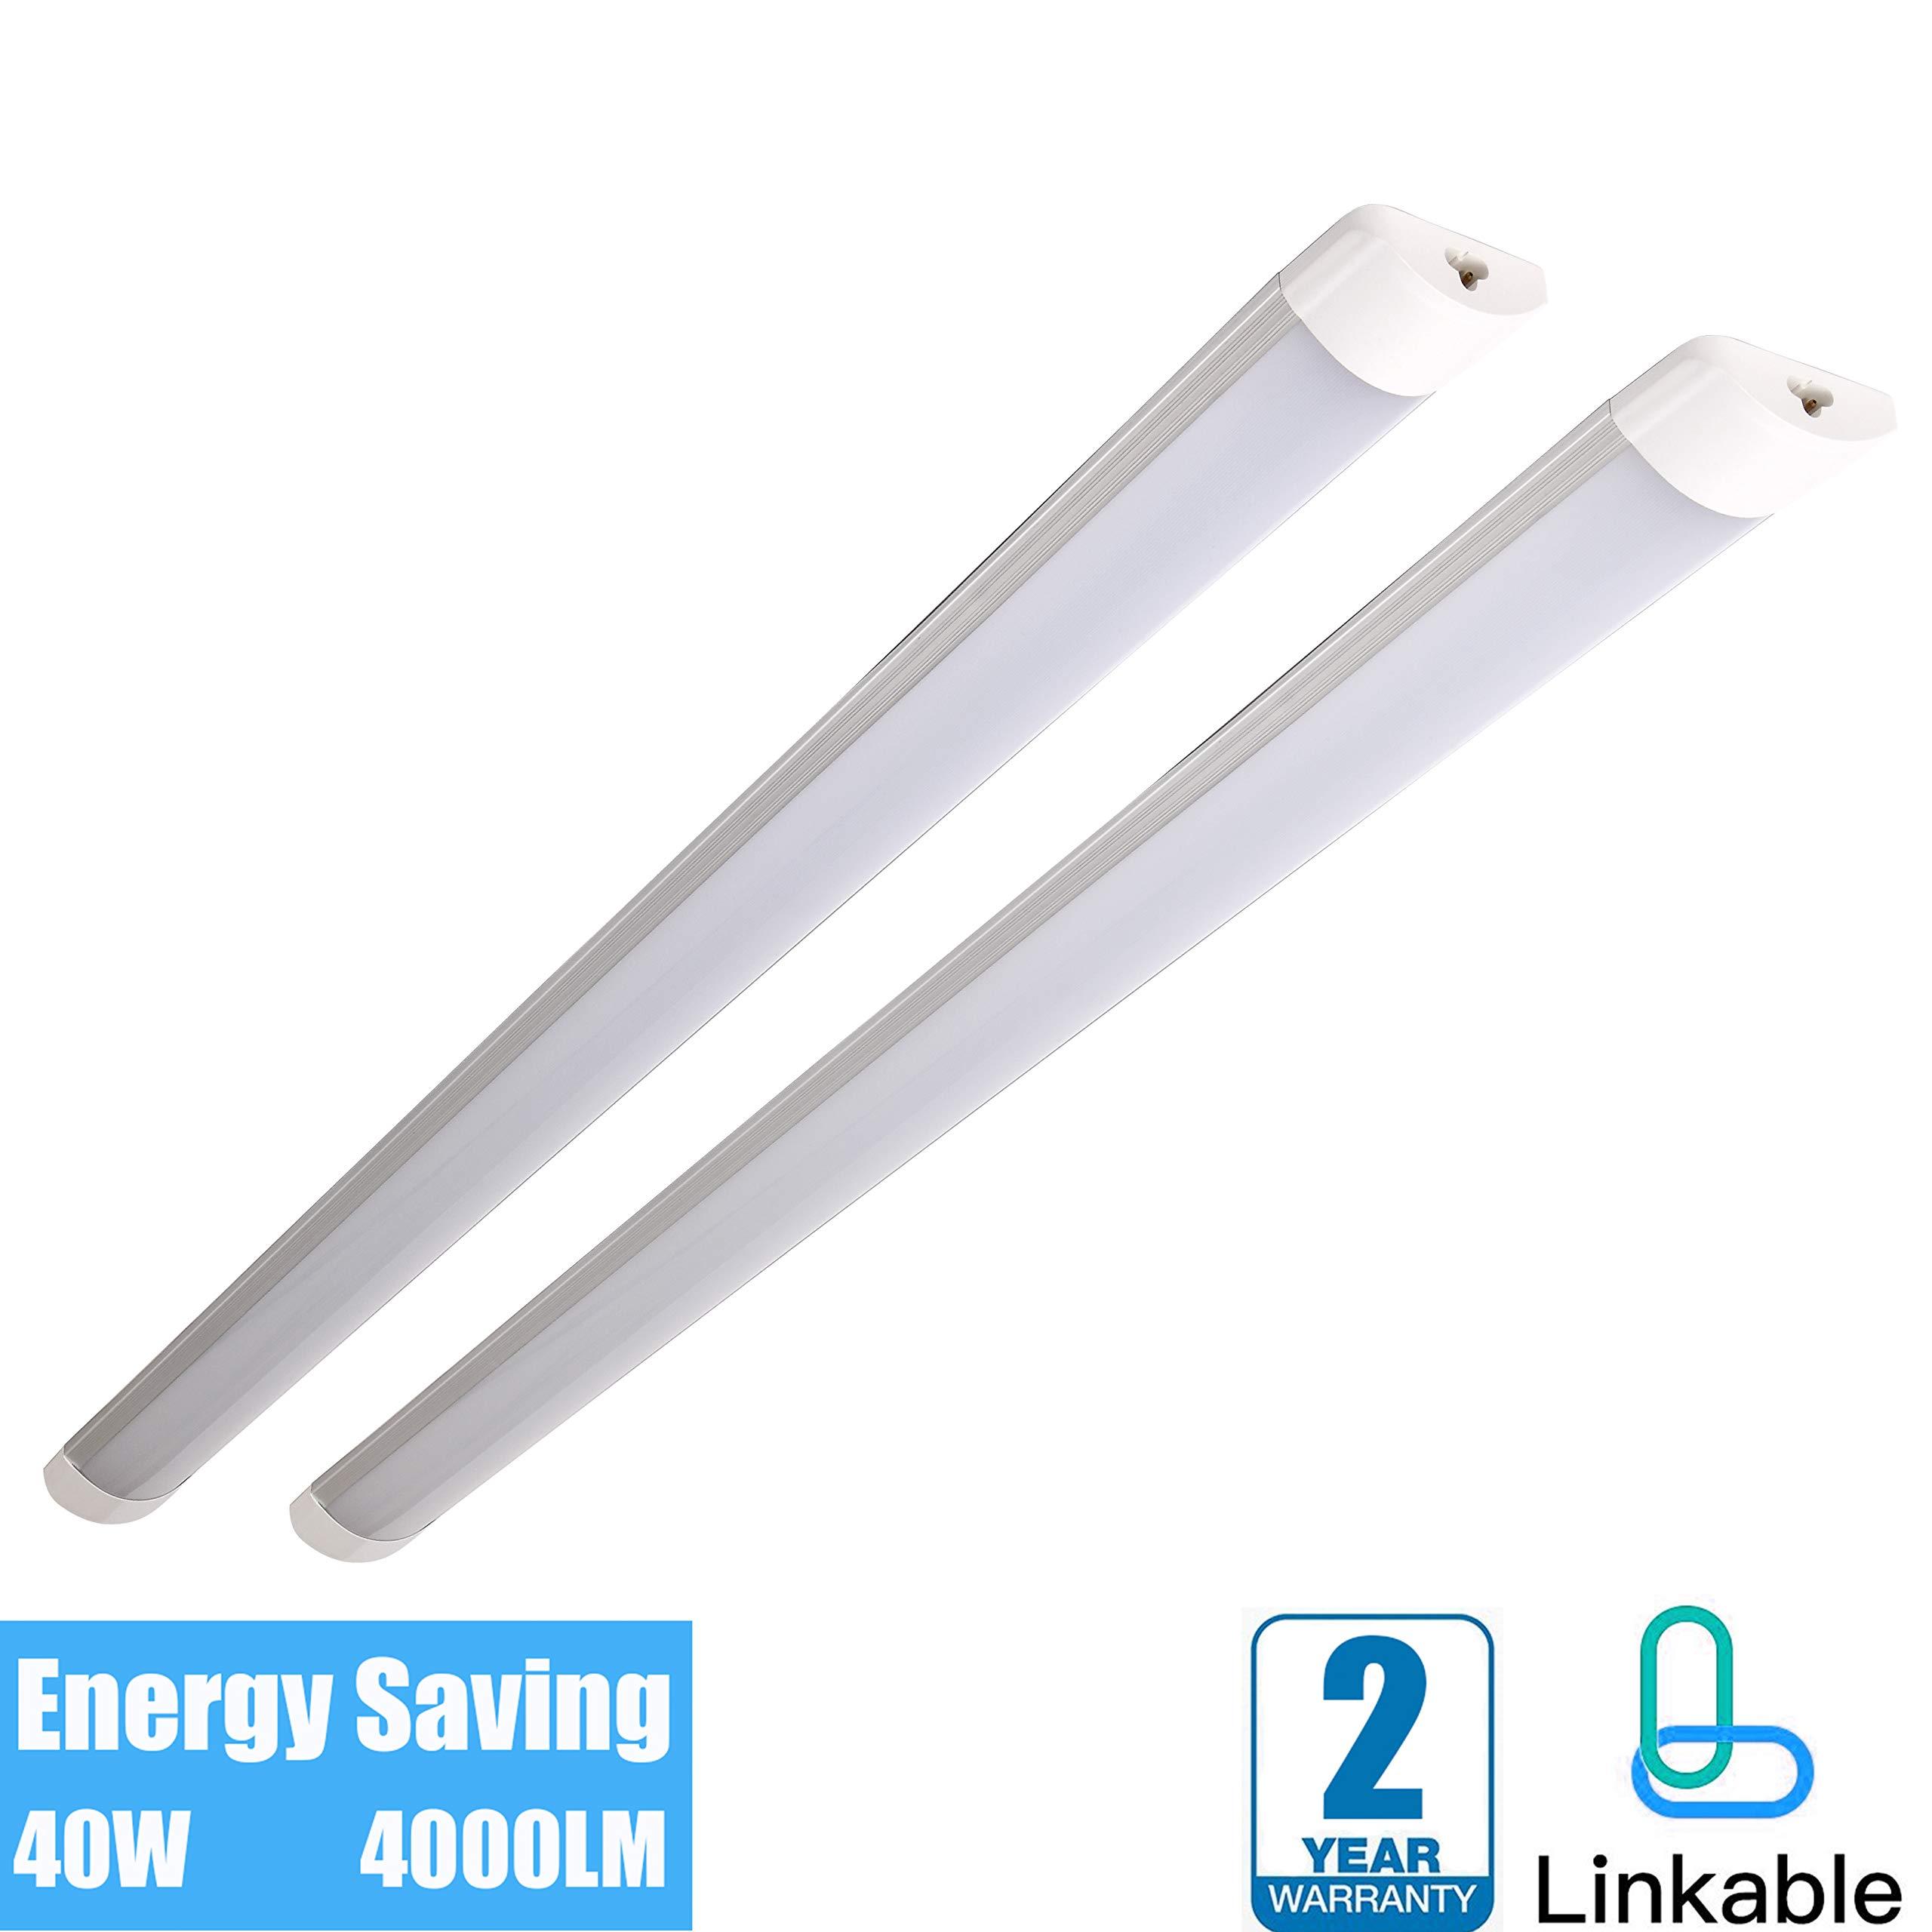 40W Linkable Utility LED Shop Light 4ft for Garage Ceiling Super Bright Wraparound Flushmount Light 4000 Lumens 6500K, Built-in ON/Off Switch Linear Light Bar, Basement Workbench Lighting (2-Pack)